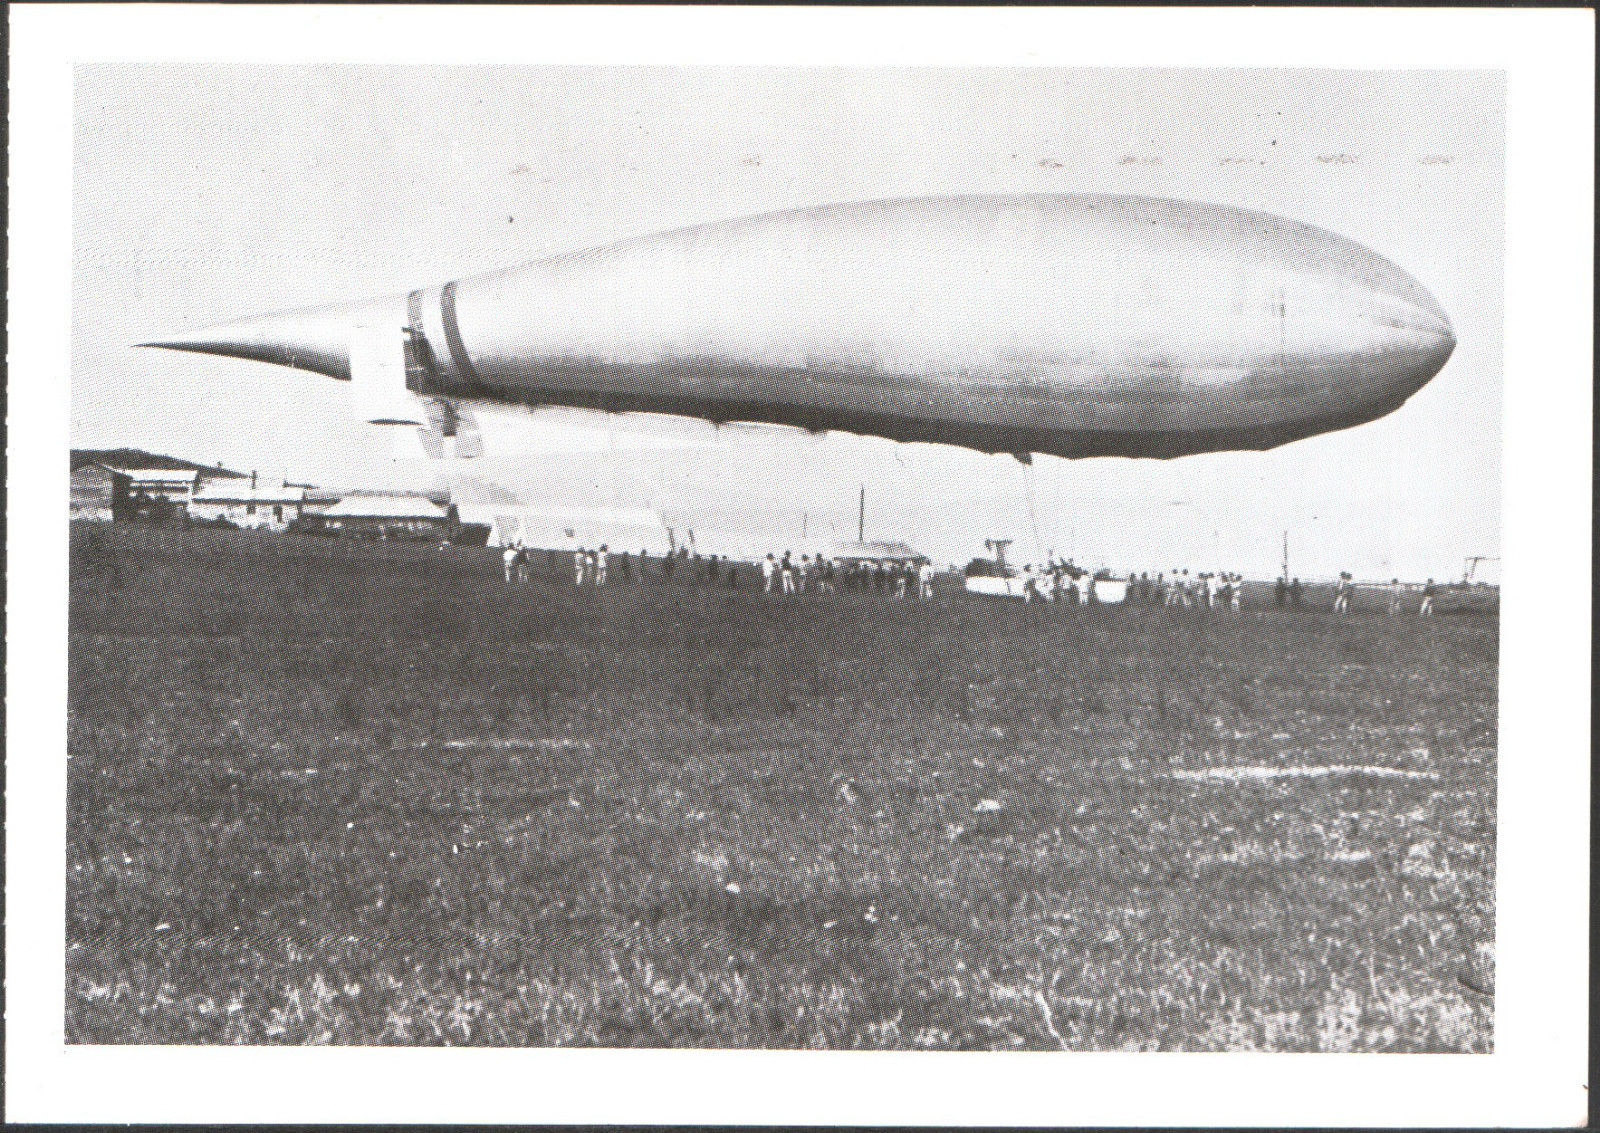 Dirigibile N. 1 bis Crocco-Ricaldoni - 1909